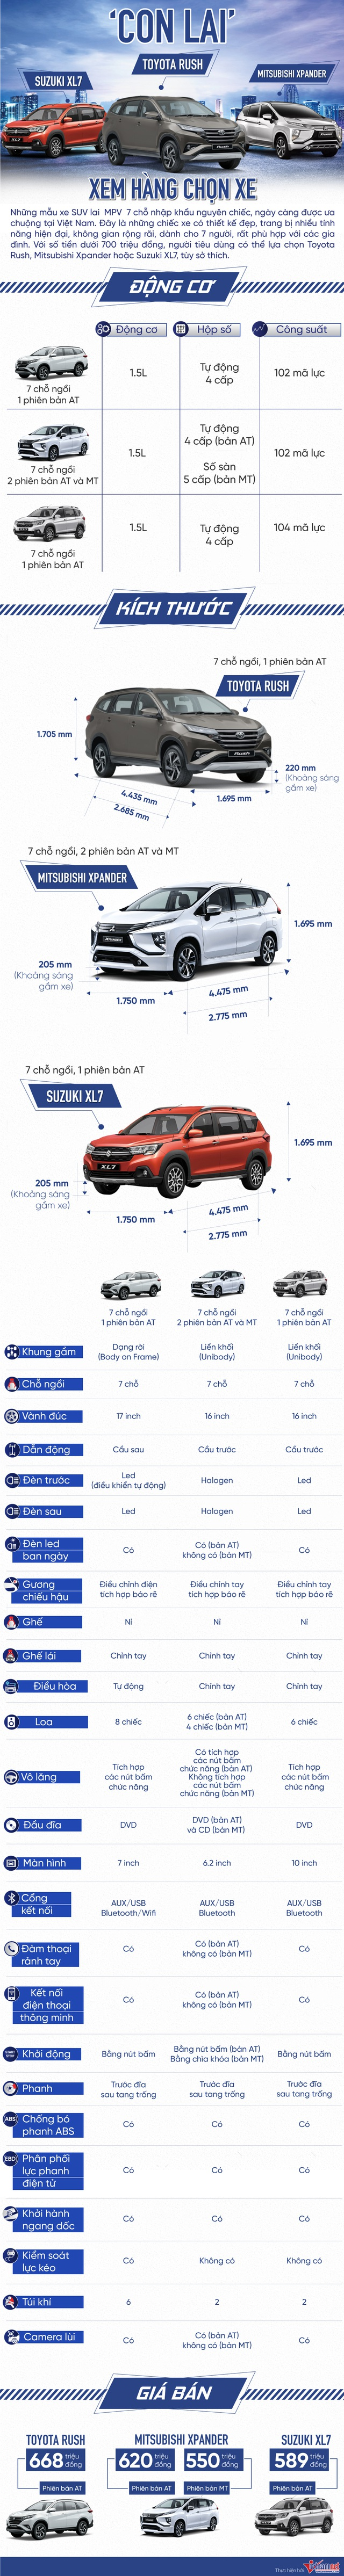 Dưới 700 triệu: Chọn Suzuki XL7, Toyota Rush hay Mitsubishi Xpander? - 1